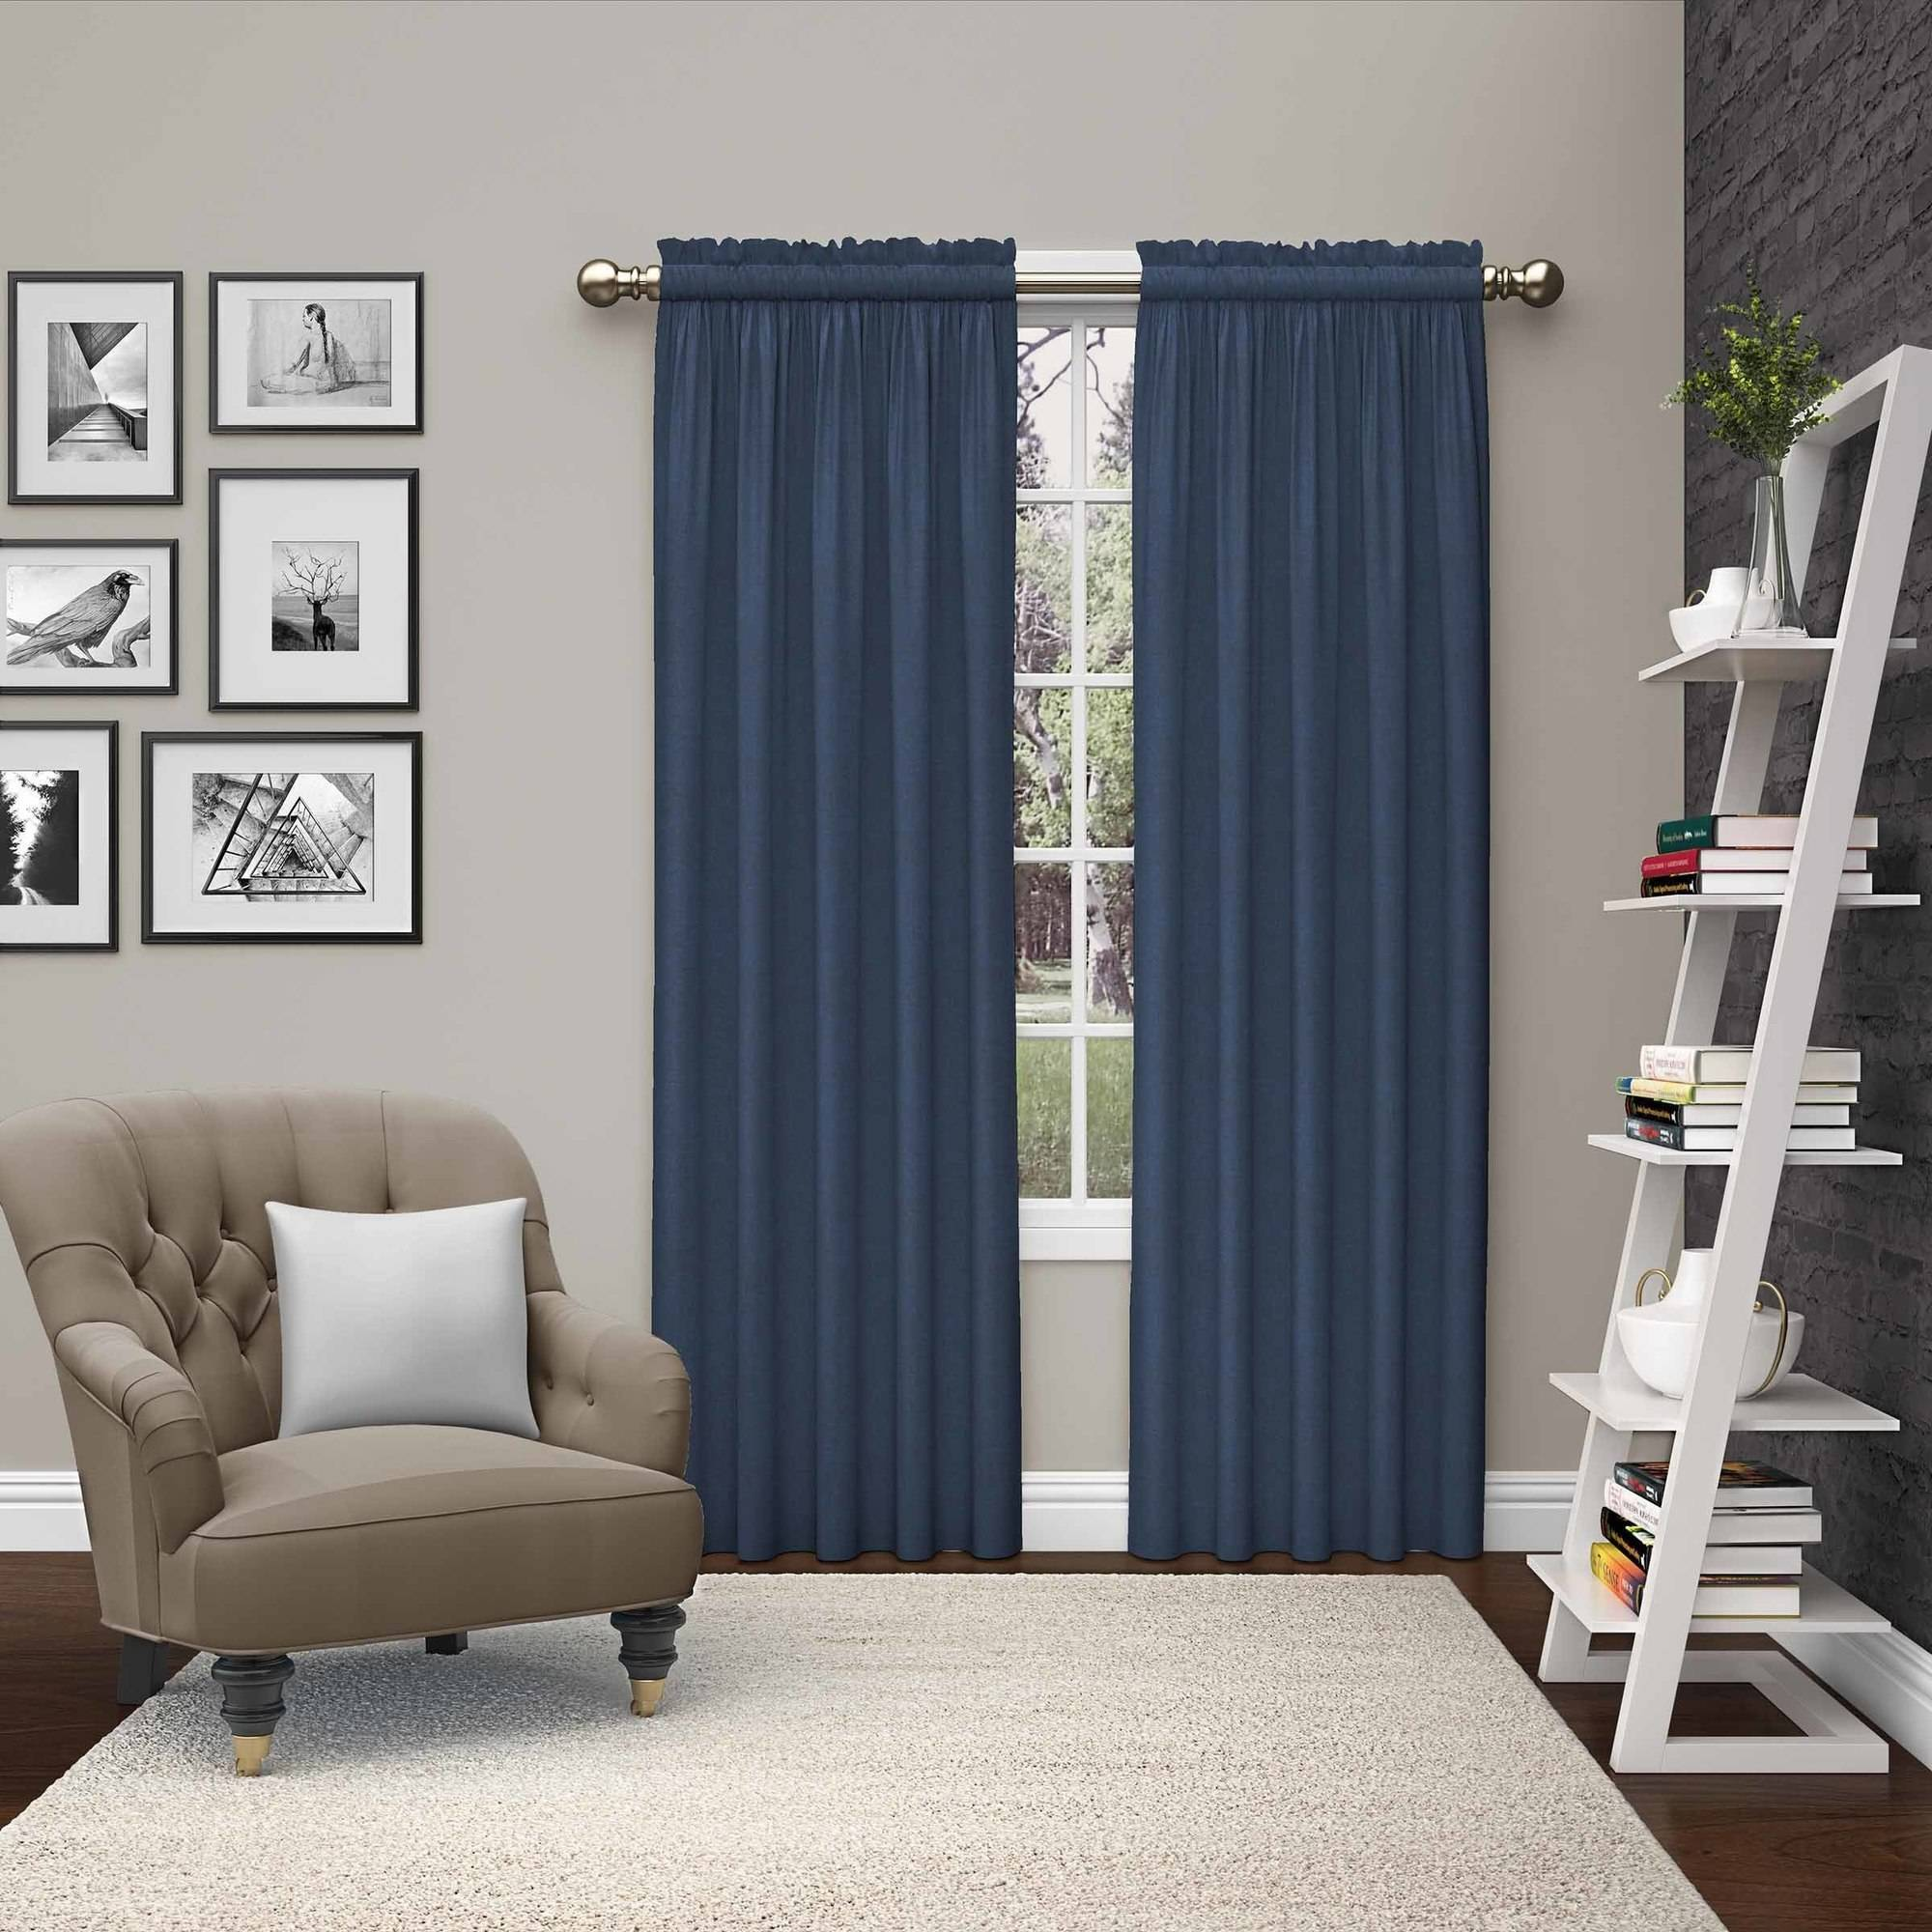 Pairs to Go Teller 2 Pack Window Curtain Panel Pairs